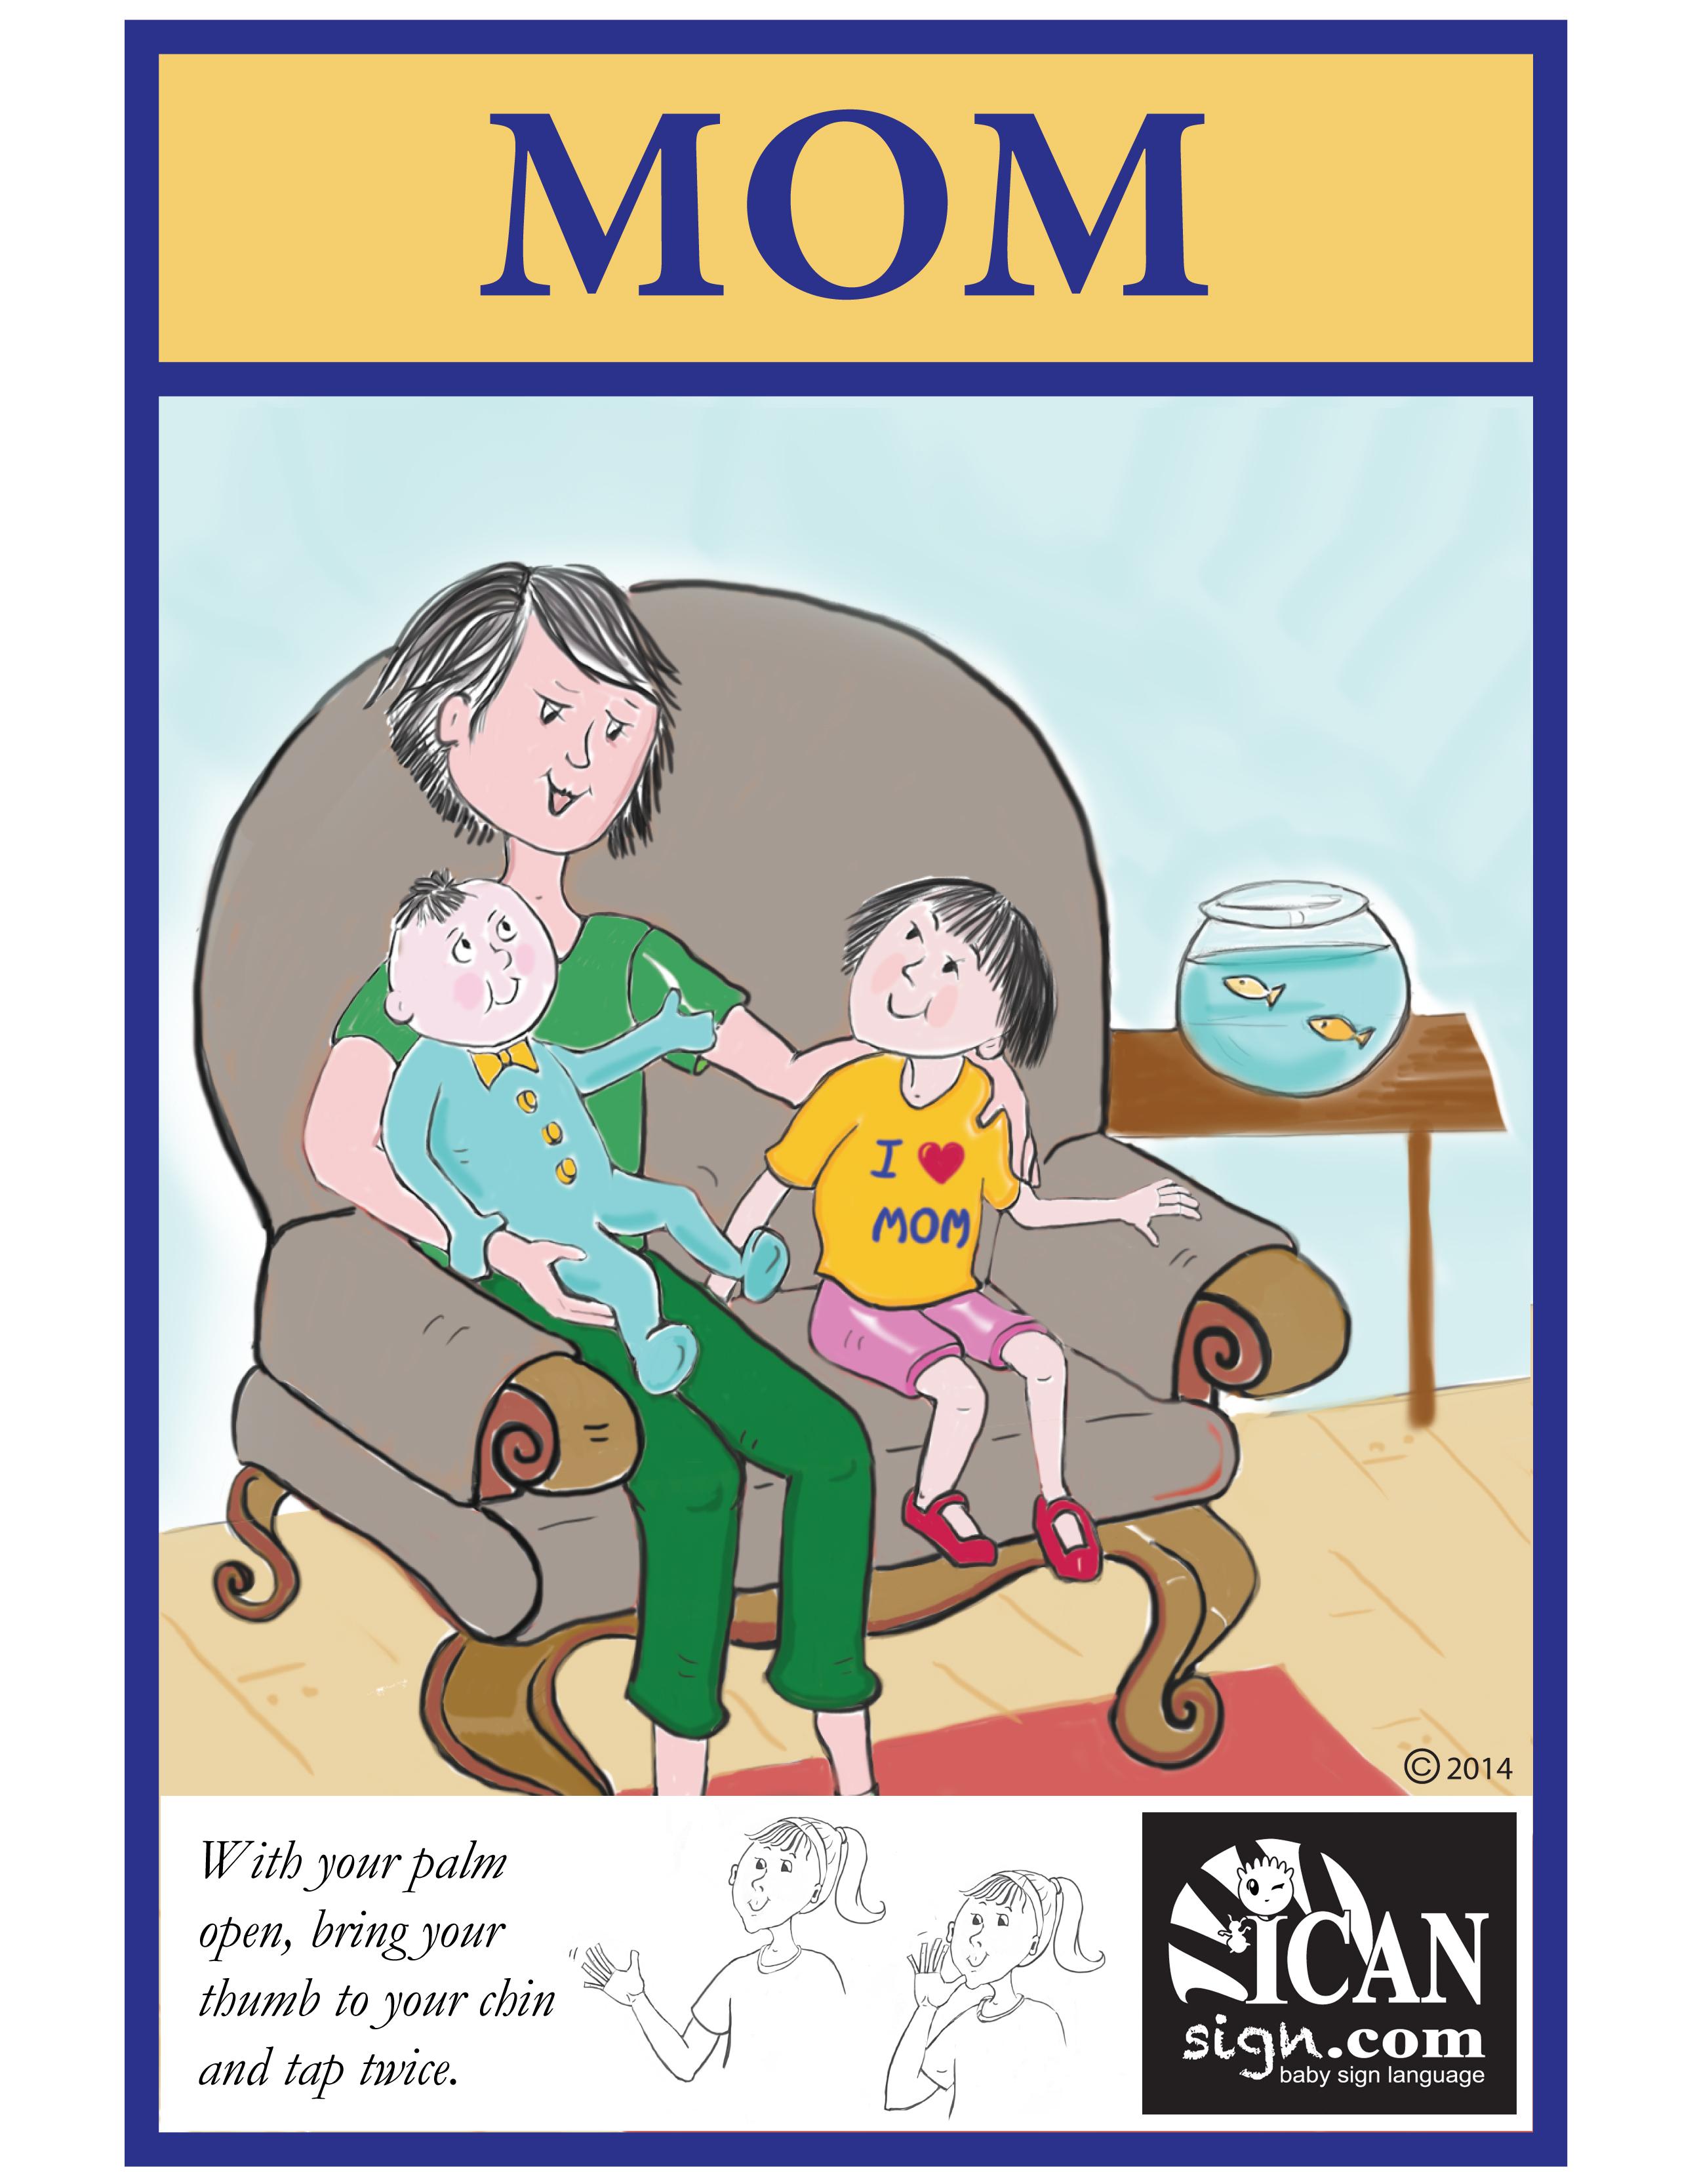 Baby Sign Language Flashcard: Mom – Free Printable Asl Flashcard - Sign Language Flash Cards Free Printable